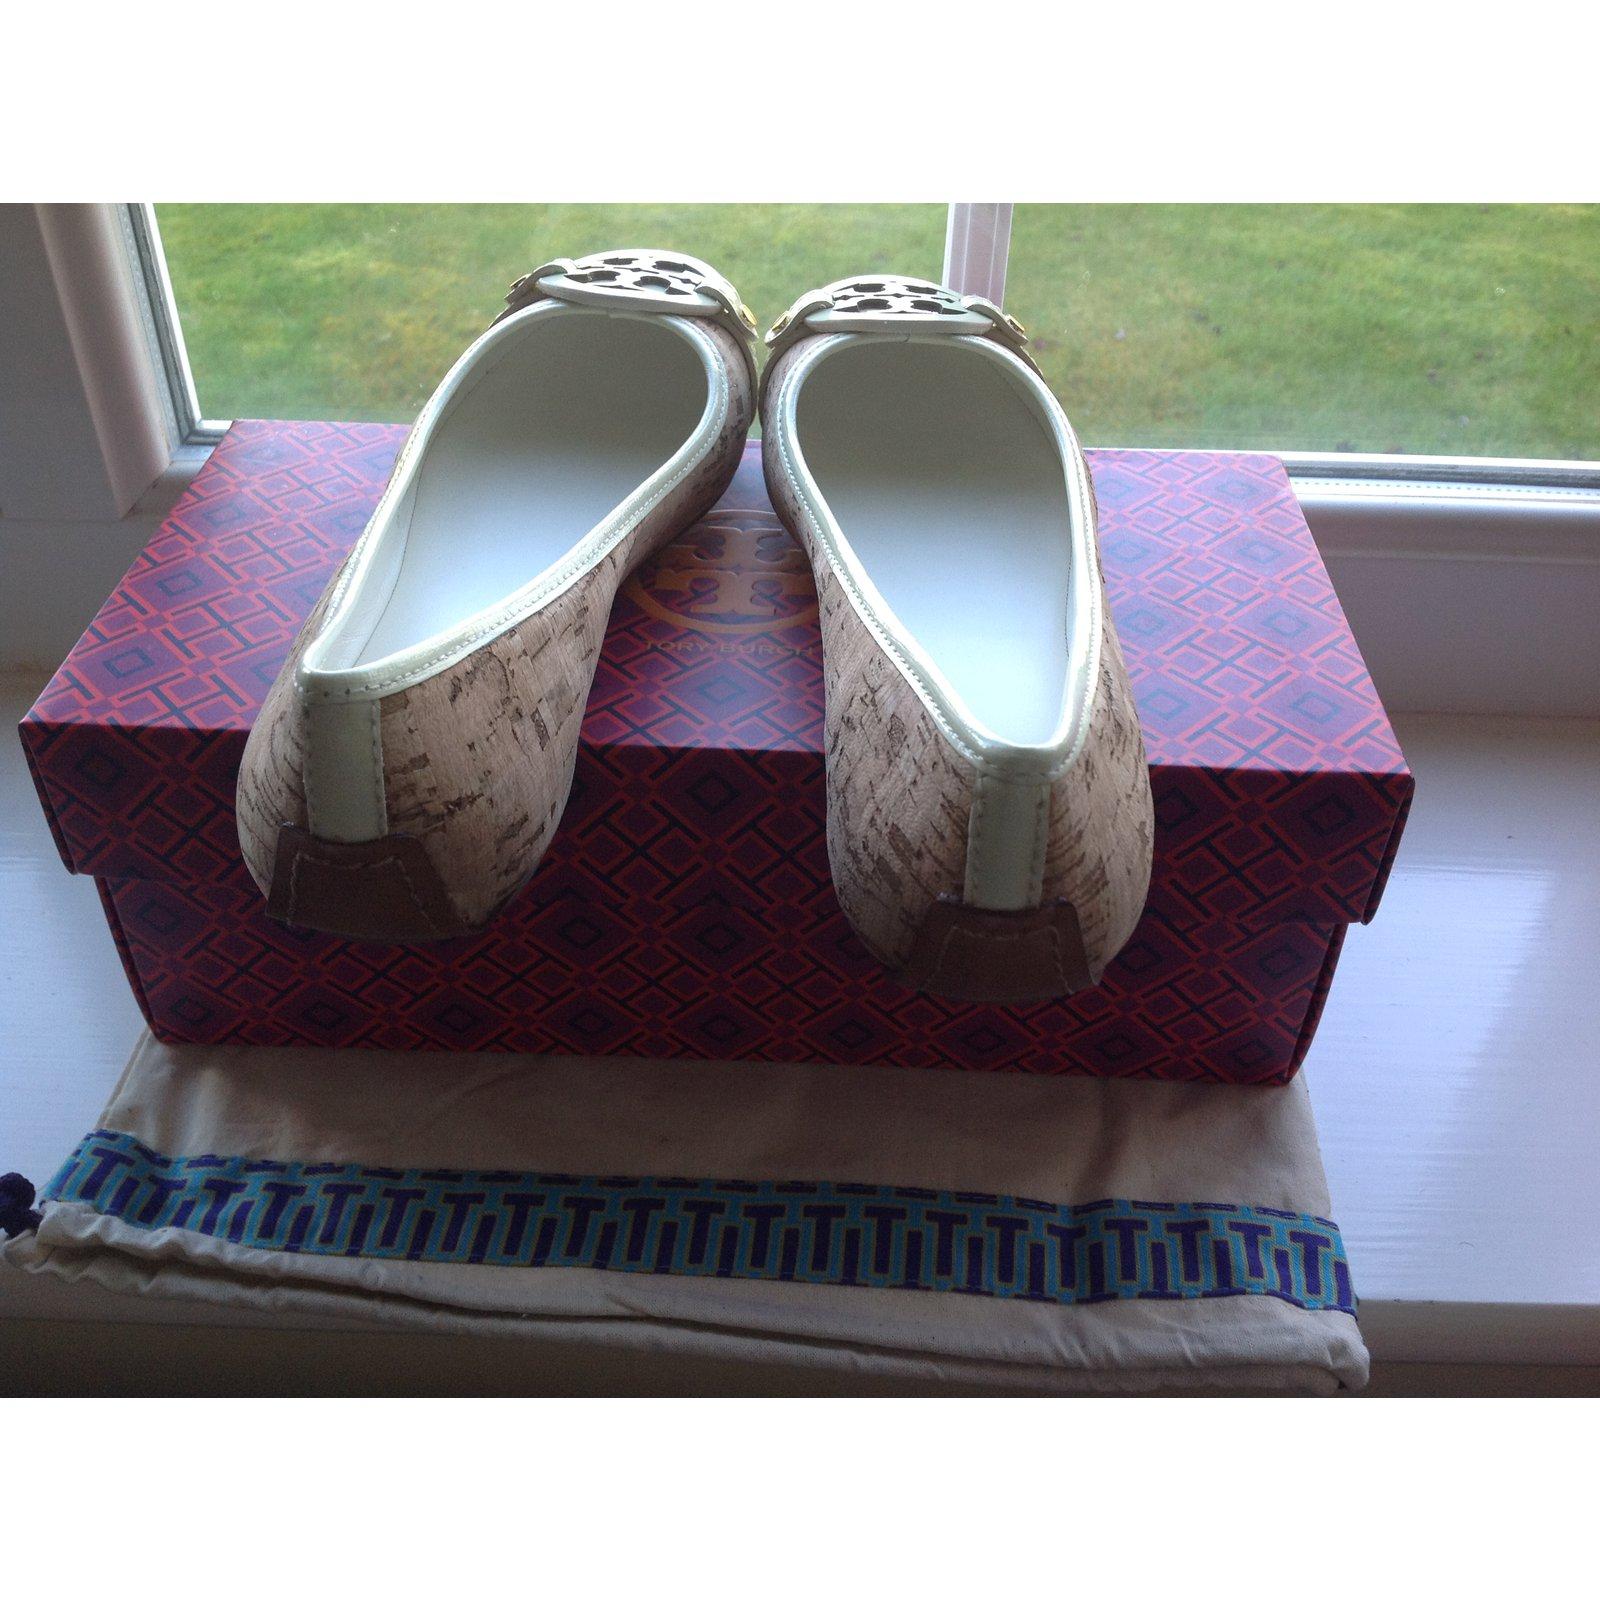 f5e7db9b808 Tory Burch Aaden Ballet cork natural ivory Ballet flats Leather Multiple  colors ref.20577 - Joli Closet